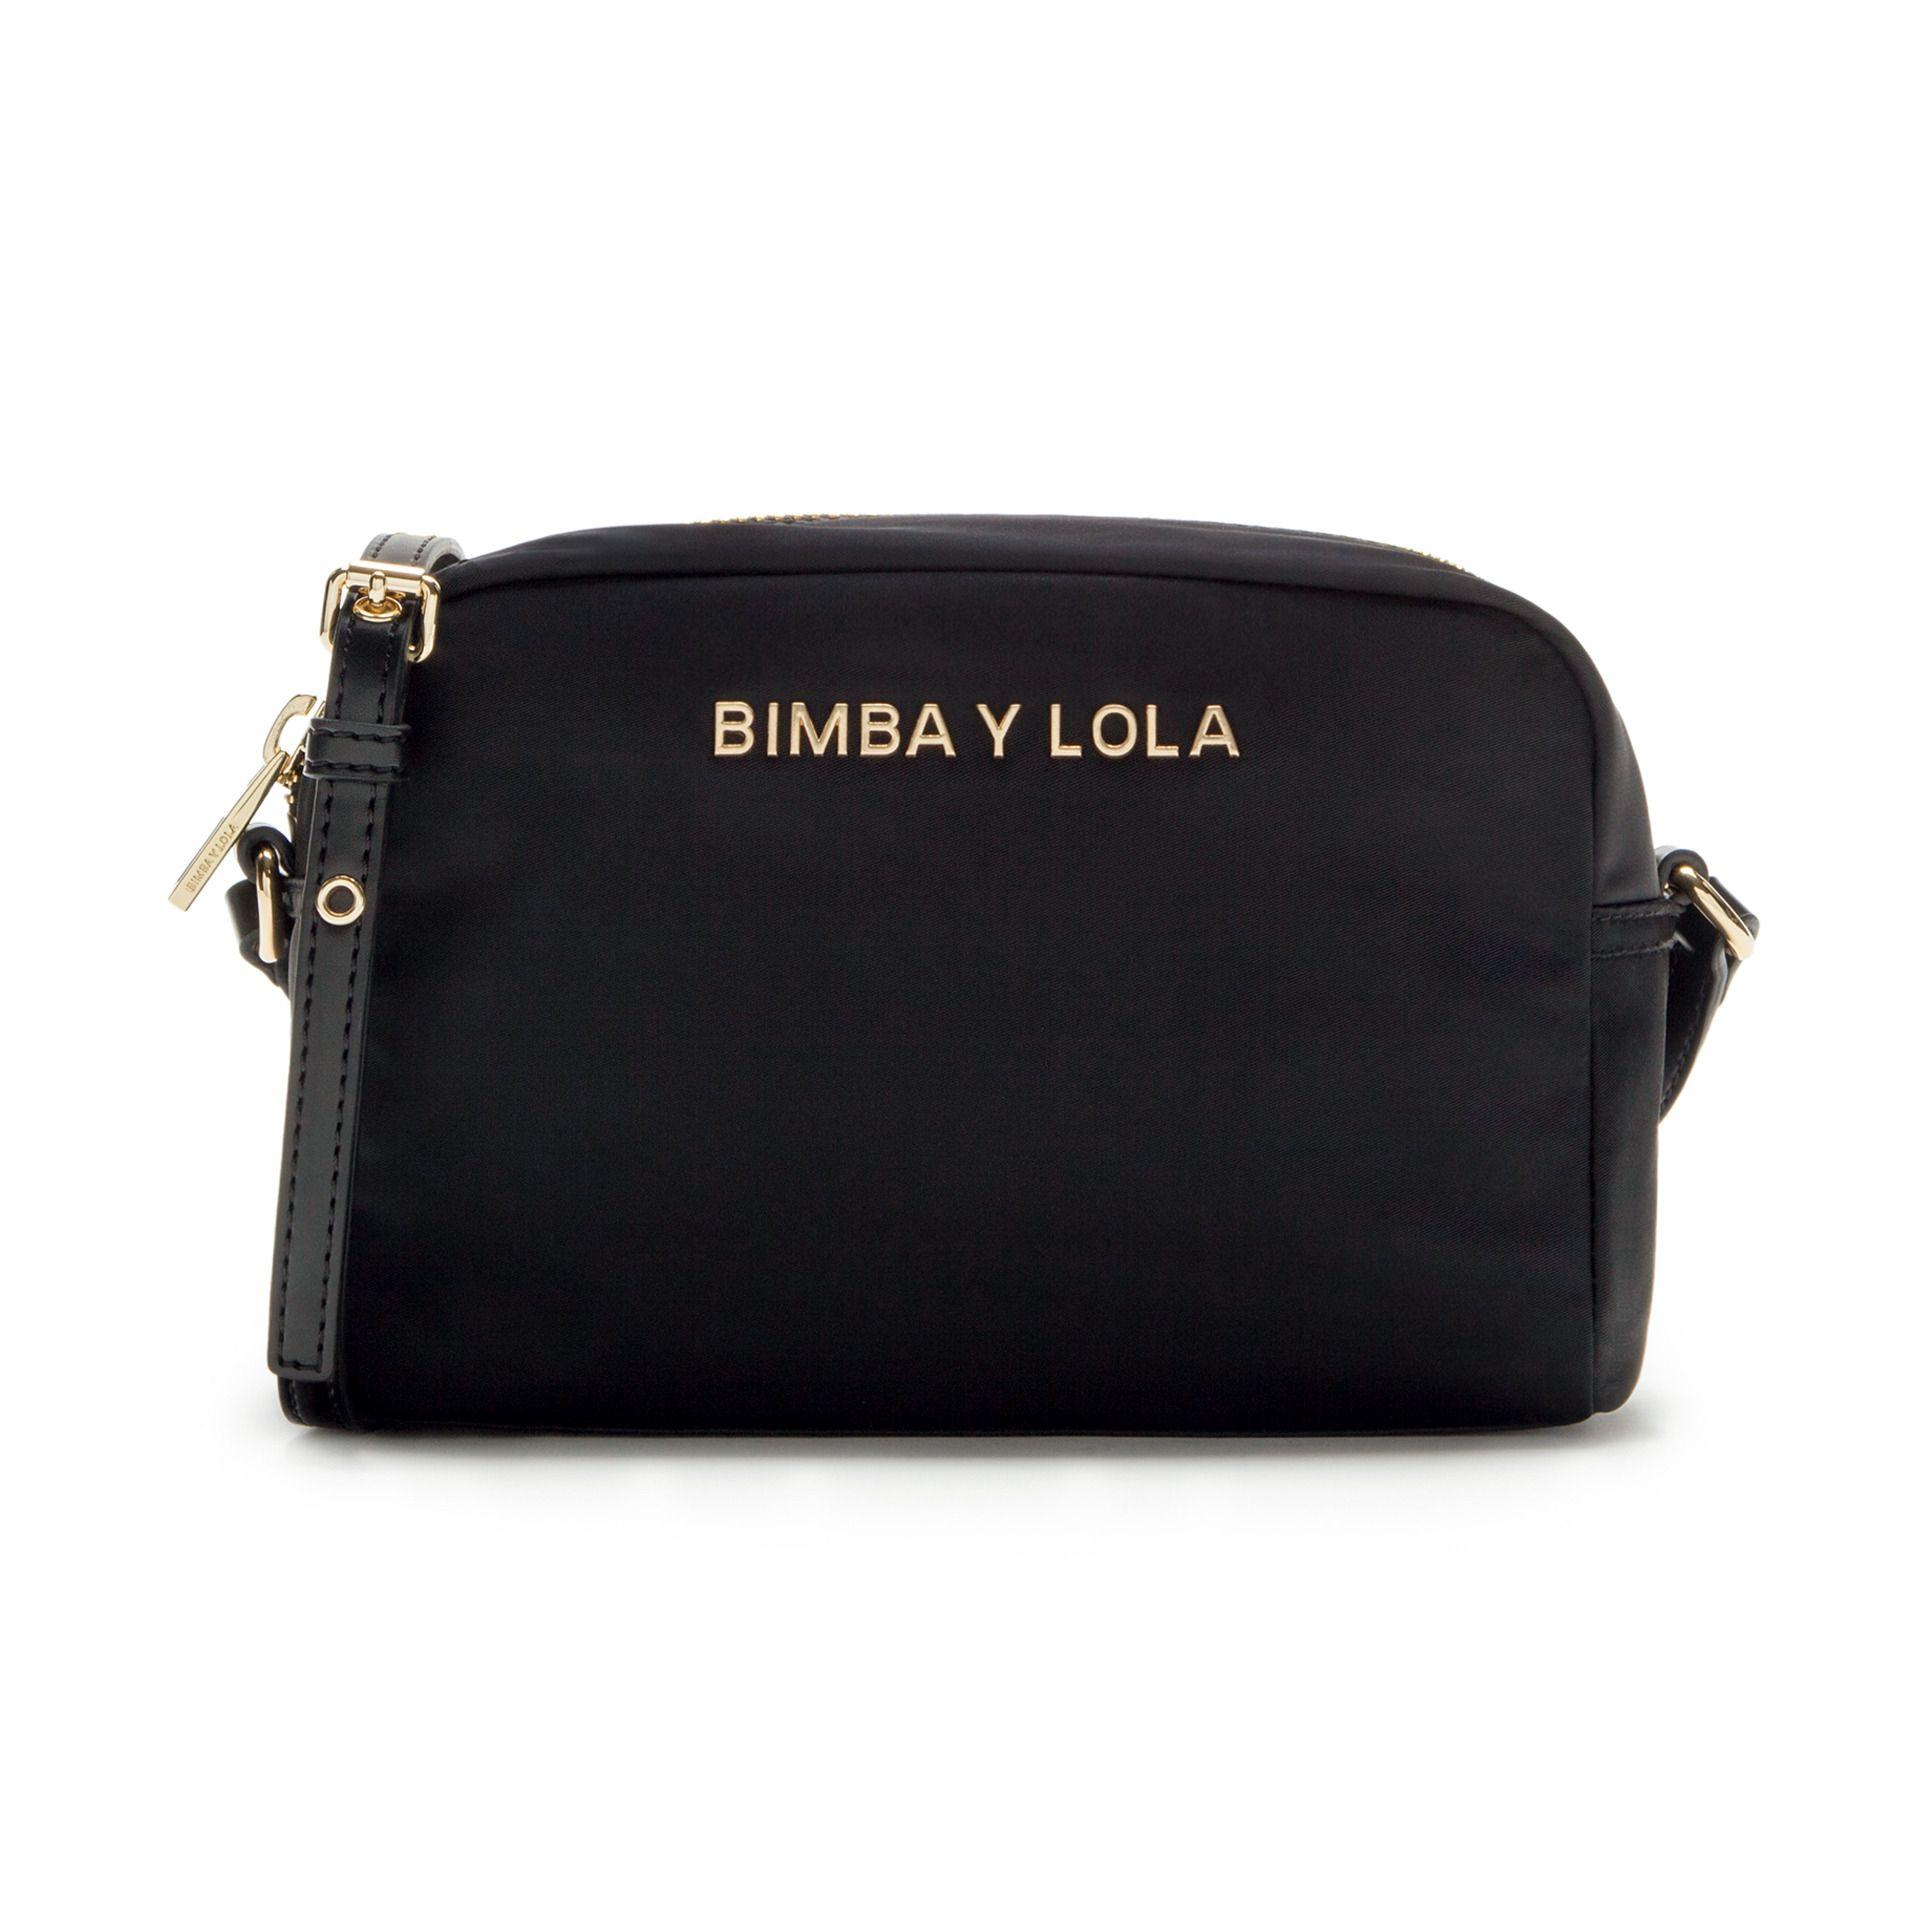 e6b1d319535cd Bandolera rectangular BIMBA Y LOLA en color negro. Pertenece a la Olympia  Collection